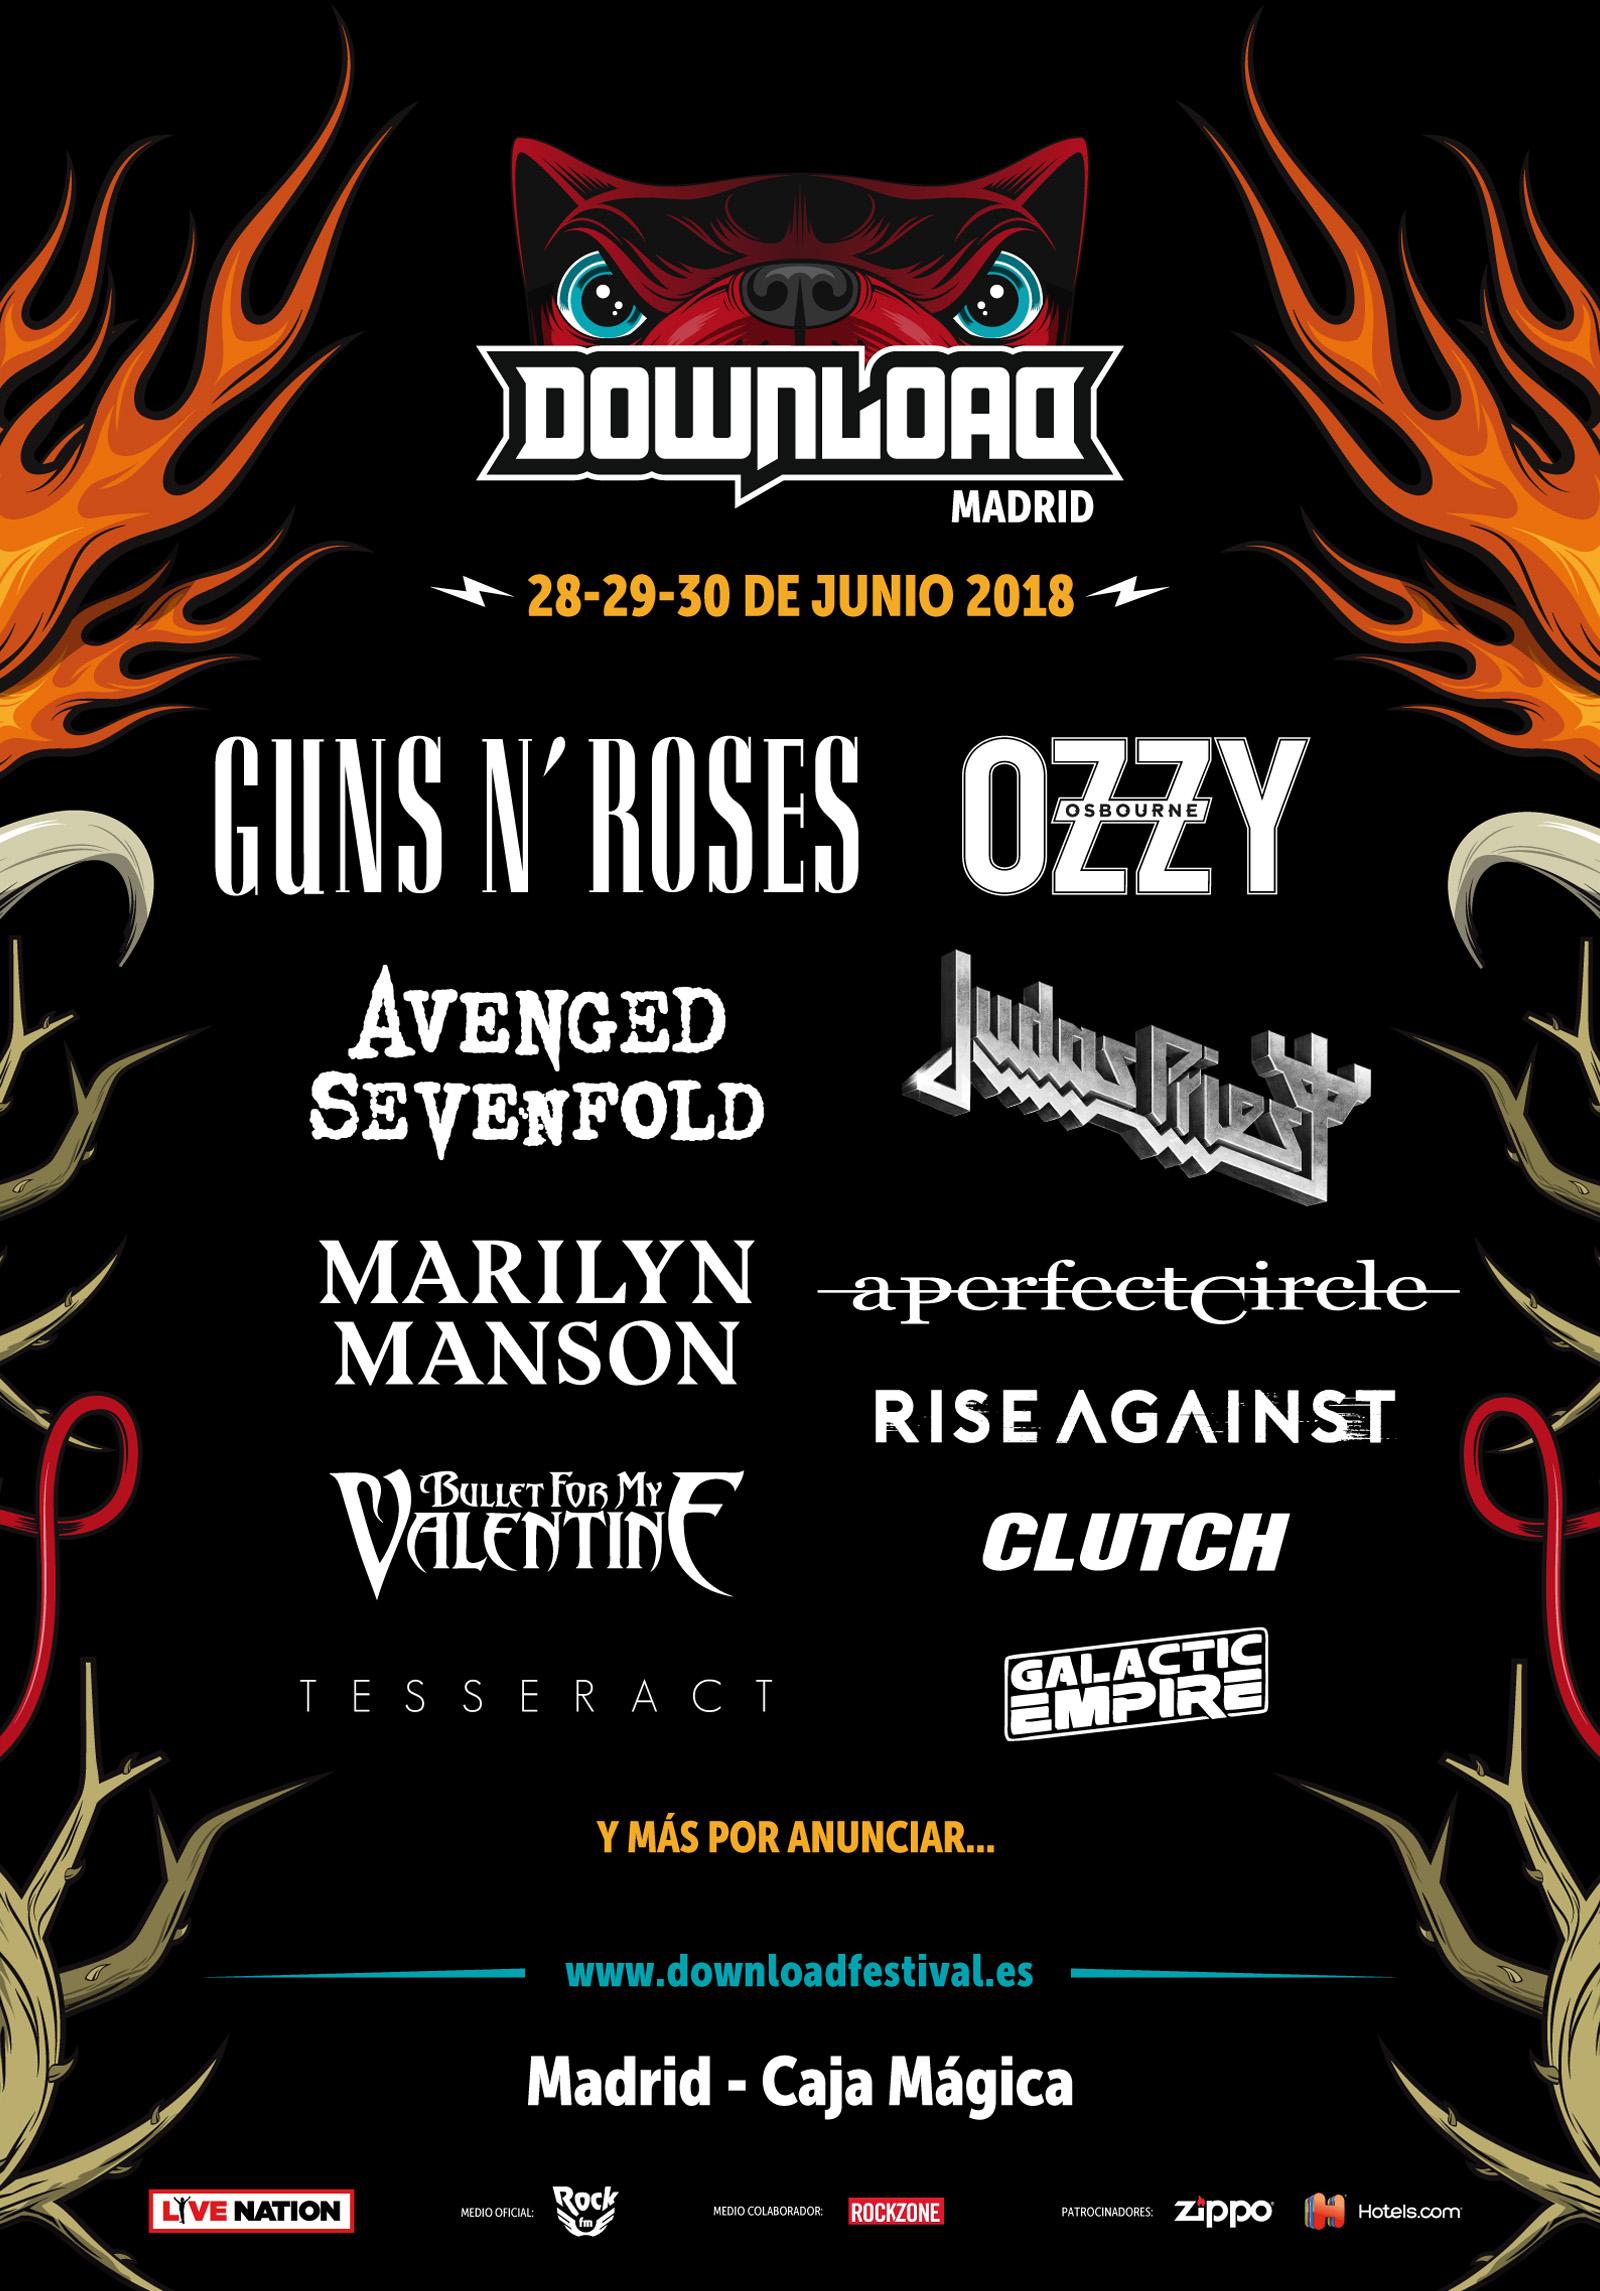 Download Festival Madrid 2018 1510341040